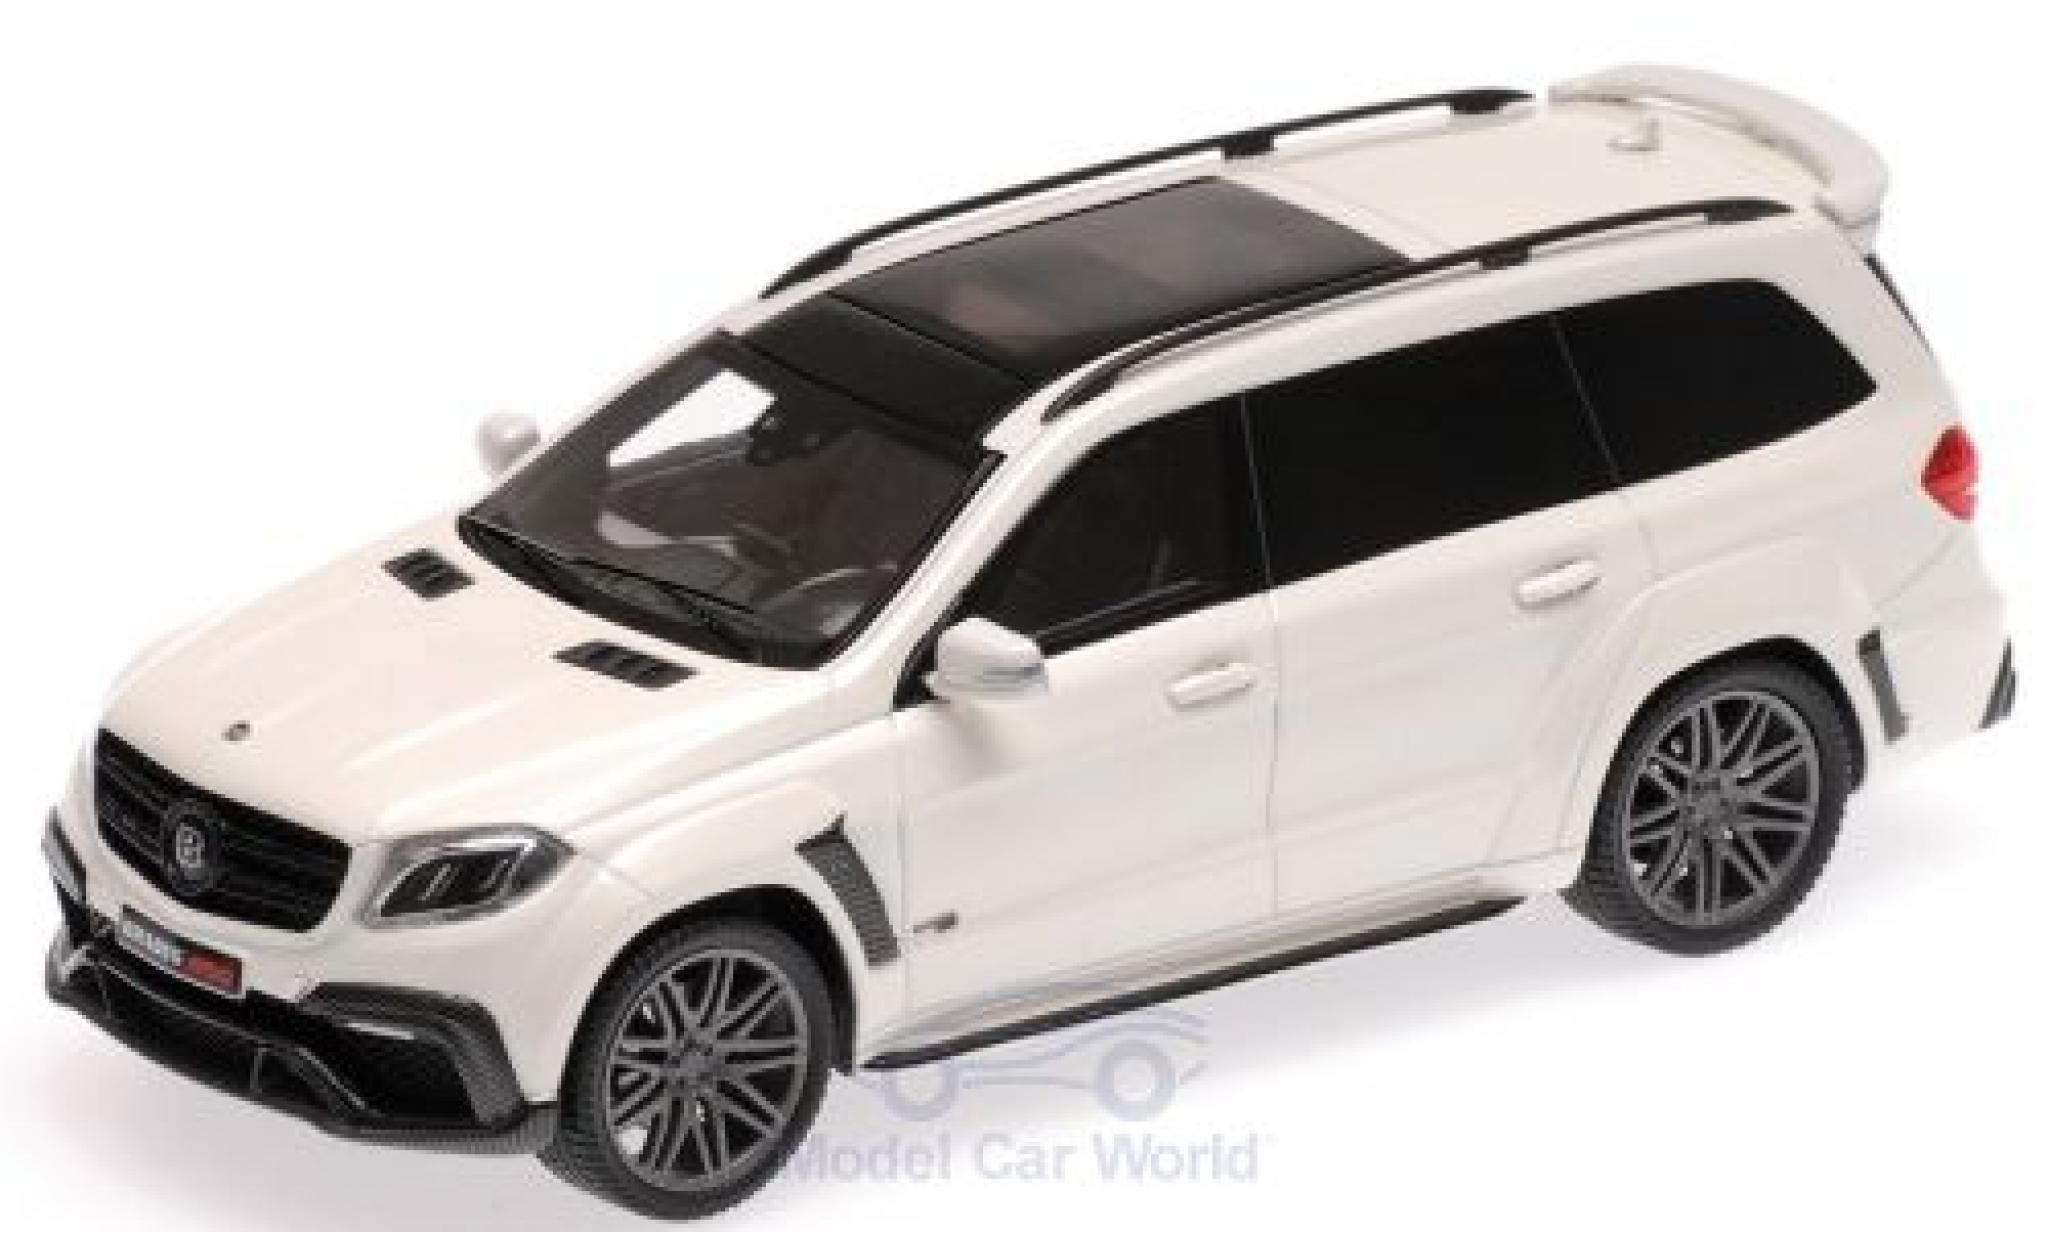 Mercedes Classe S 1/43 Minichamps Brabus 850 Widestar XL metallise blanche 2017 Basis AMG GLS 63